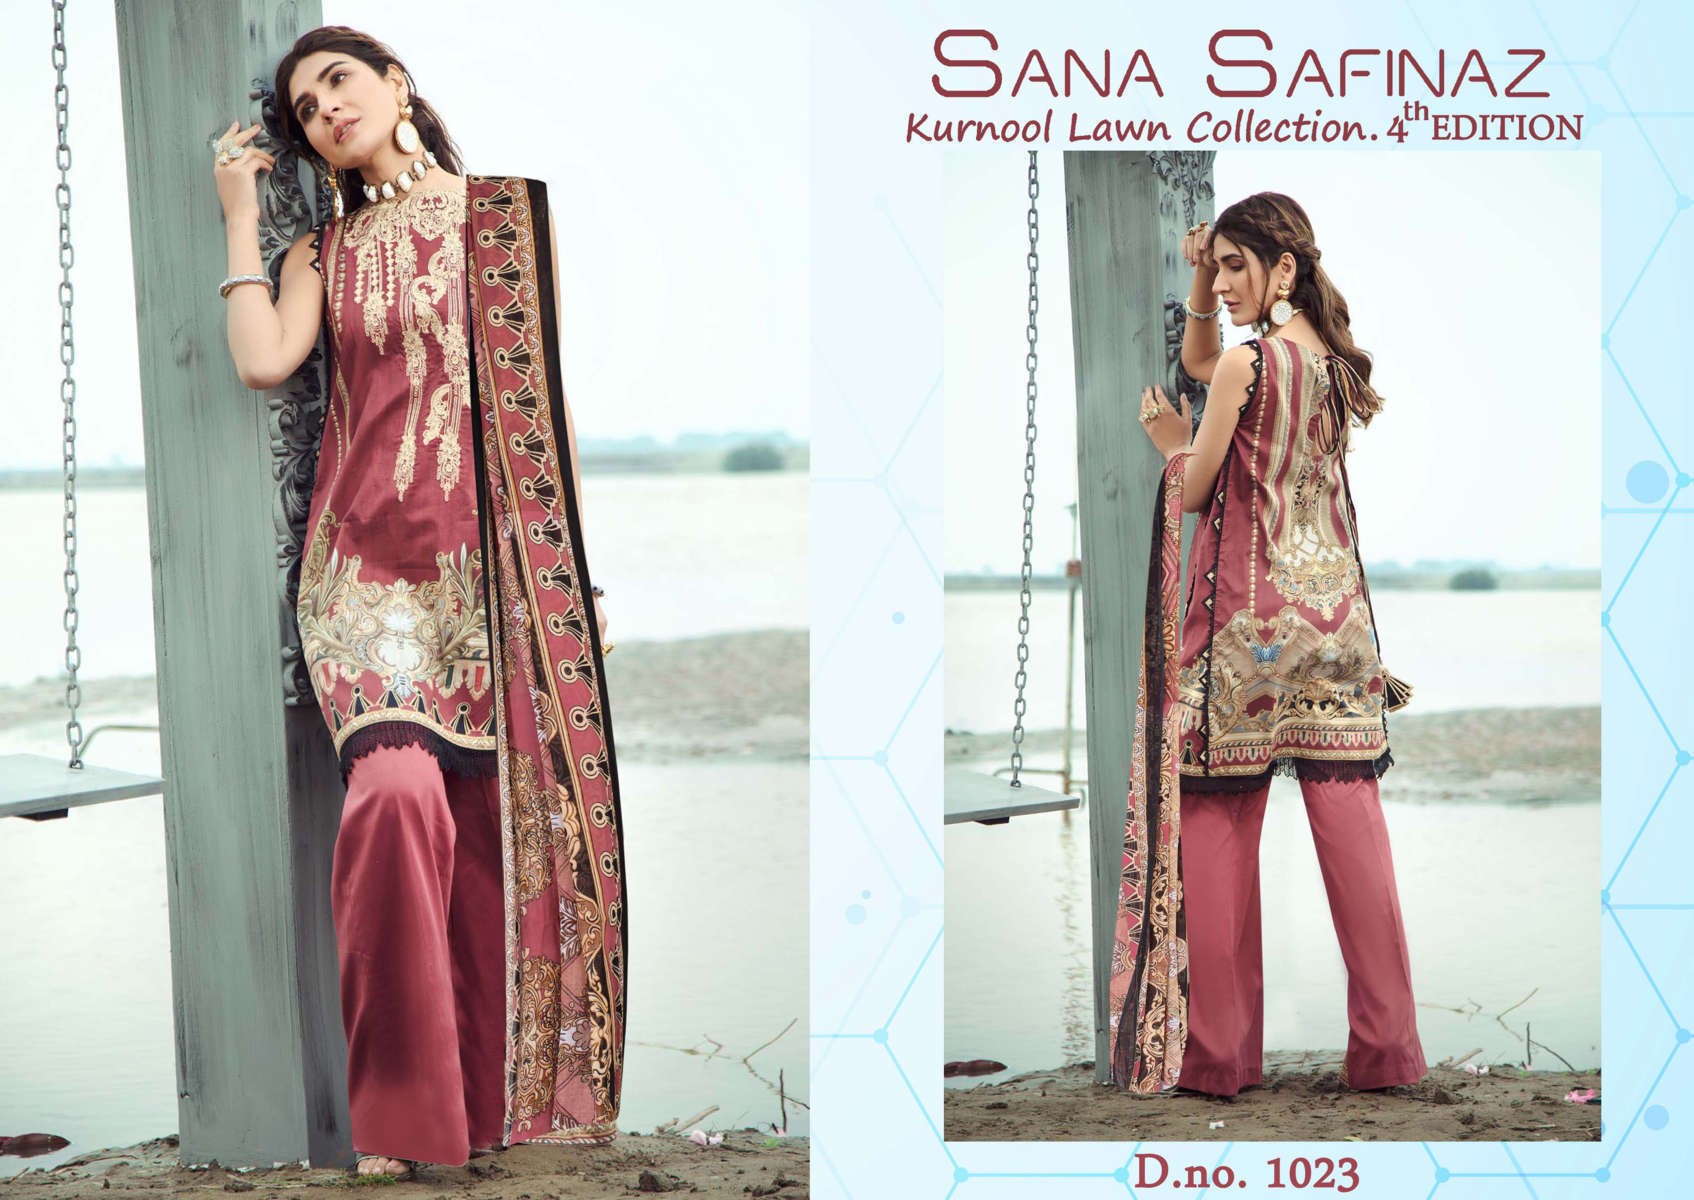 Sana Safinaz Kurnool Lawn Collection Vol 4 th Edition Salwar Suit Wholesale Catalog 4 Pcs 1 - Sana Safinaz Kurnool Lawn Collection Vol 4 th Edition Salwar Suit Wholesale Catalog 4 Pcs